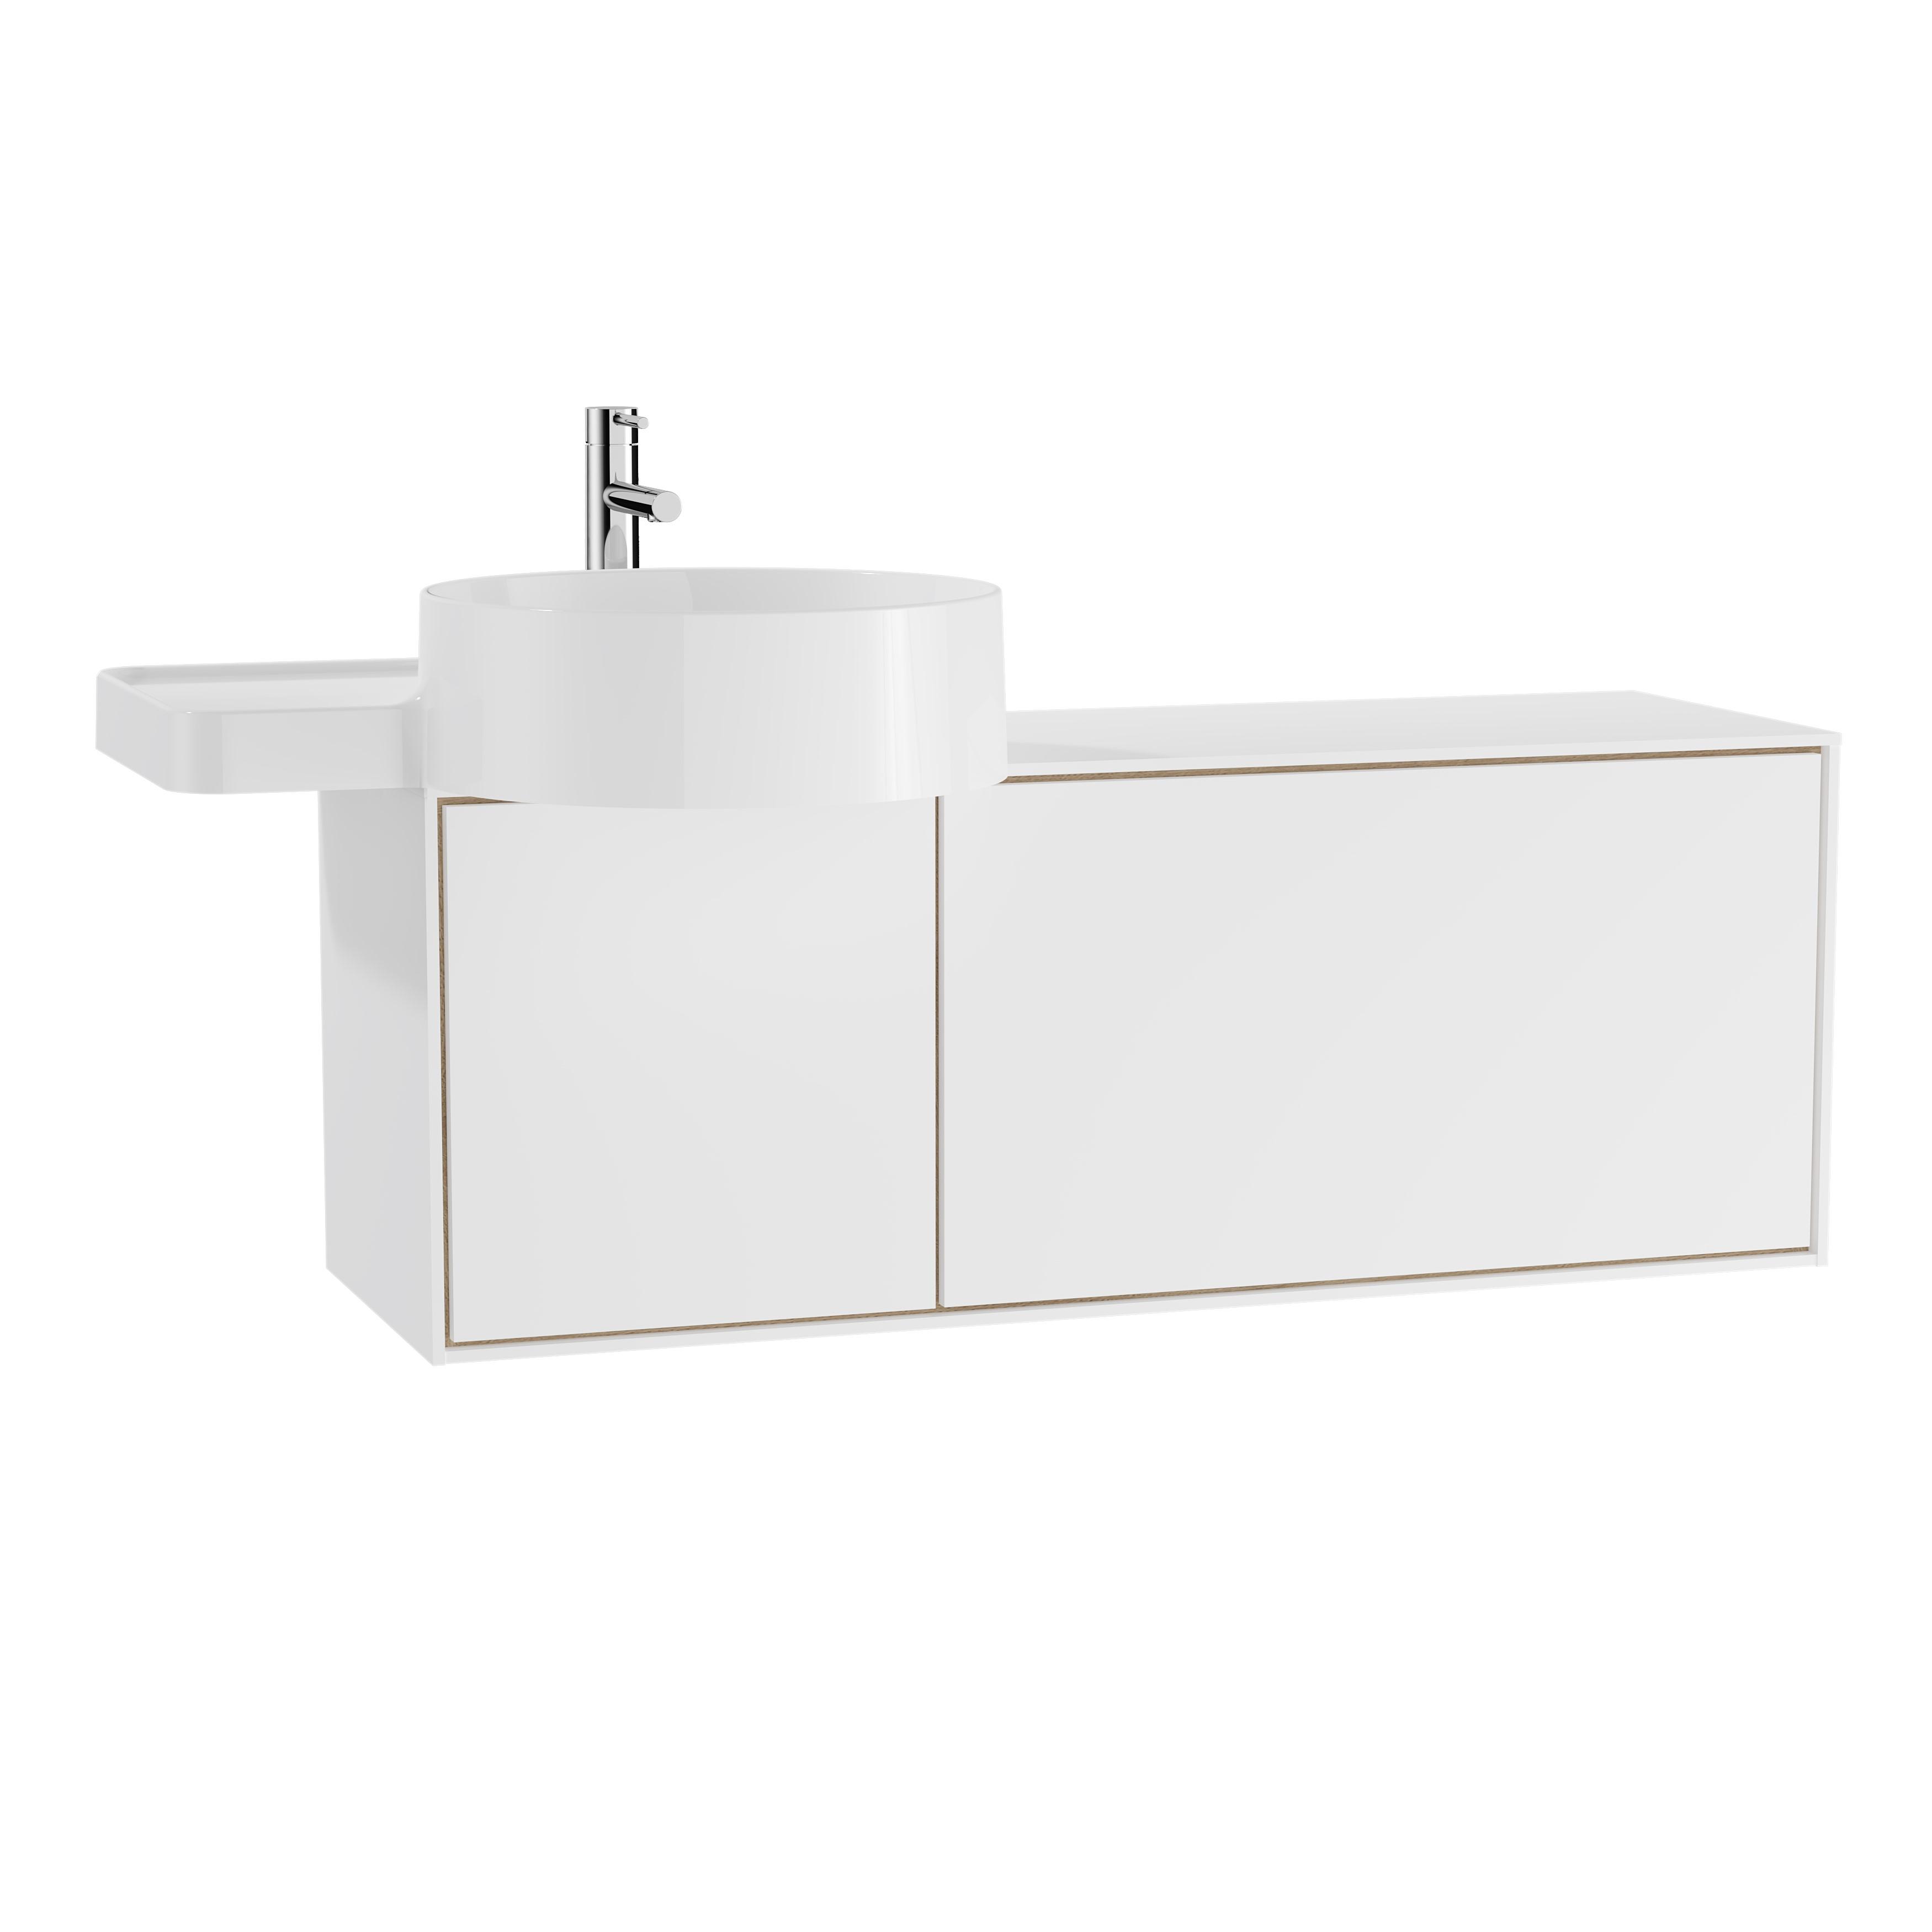 Voyage meuble ss vasque, 100 cm, blanc mat / chêne naturel, gauche